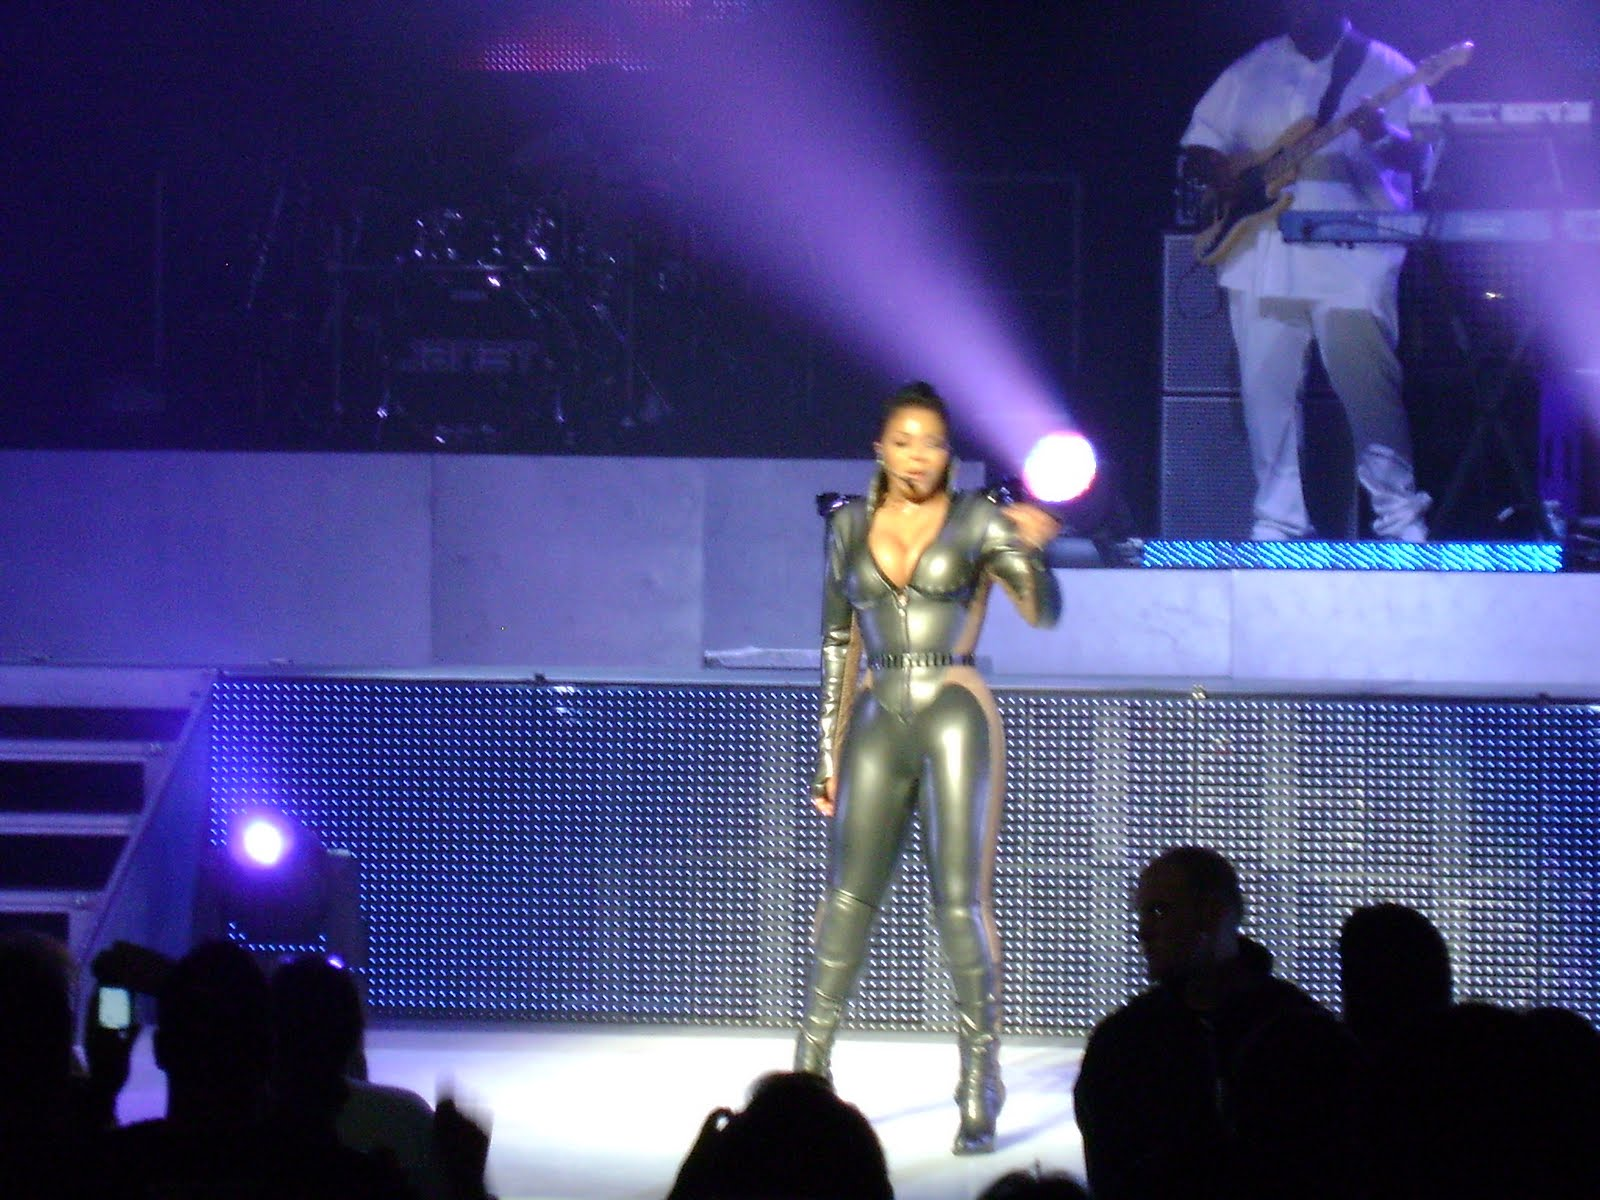 image Janet jackson toronto concert